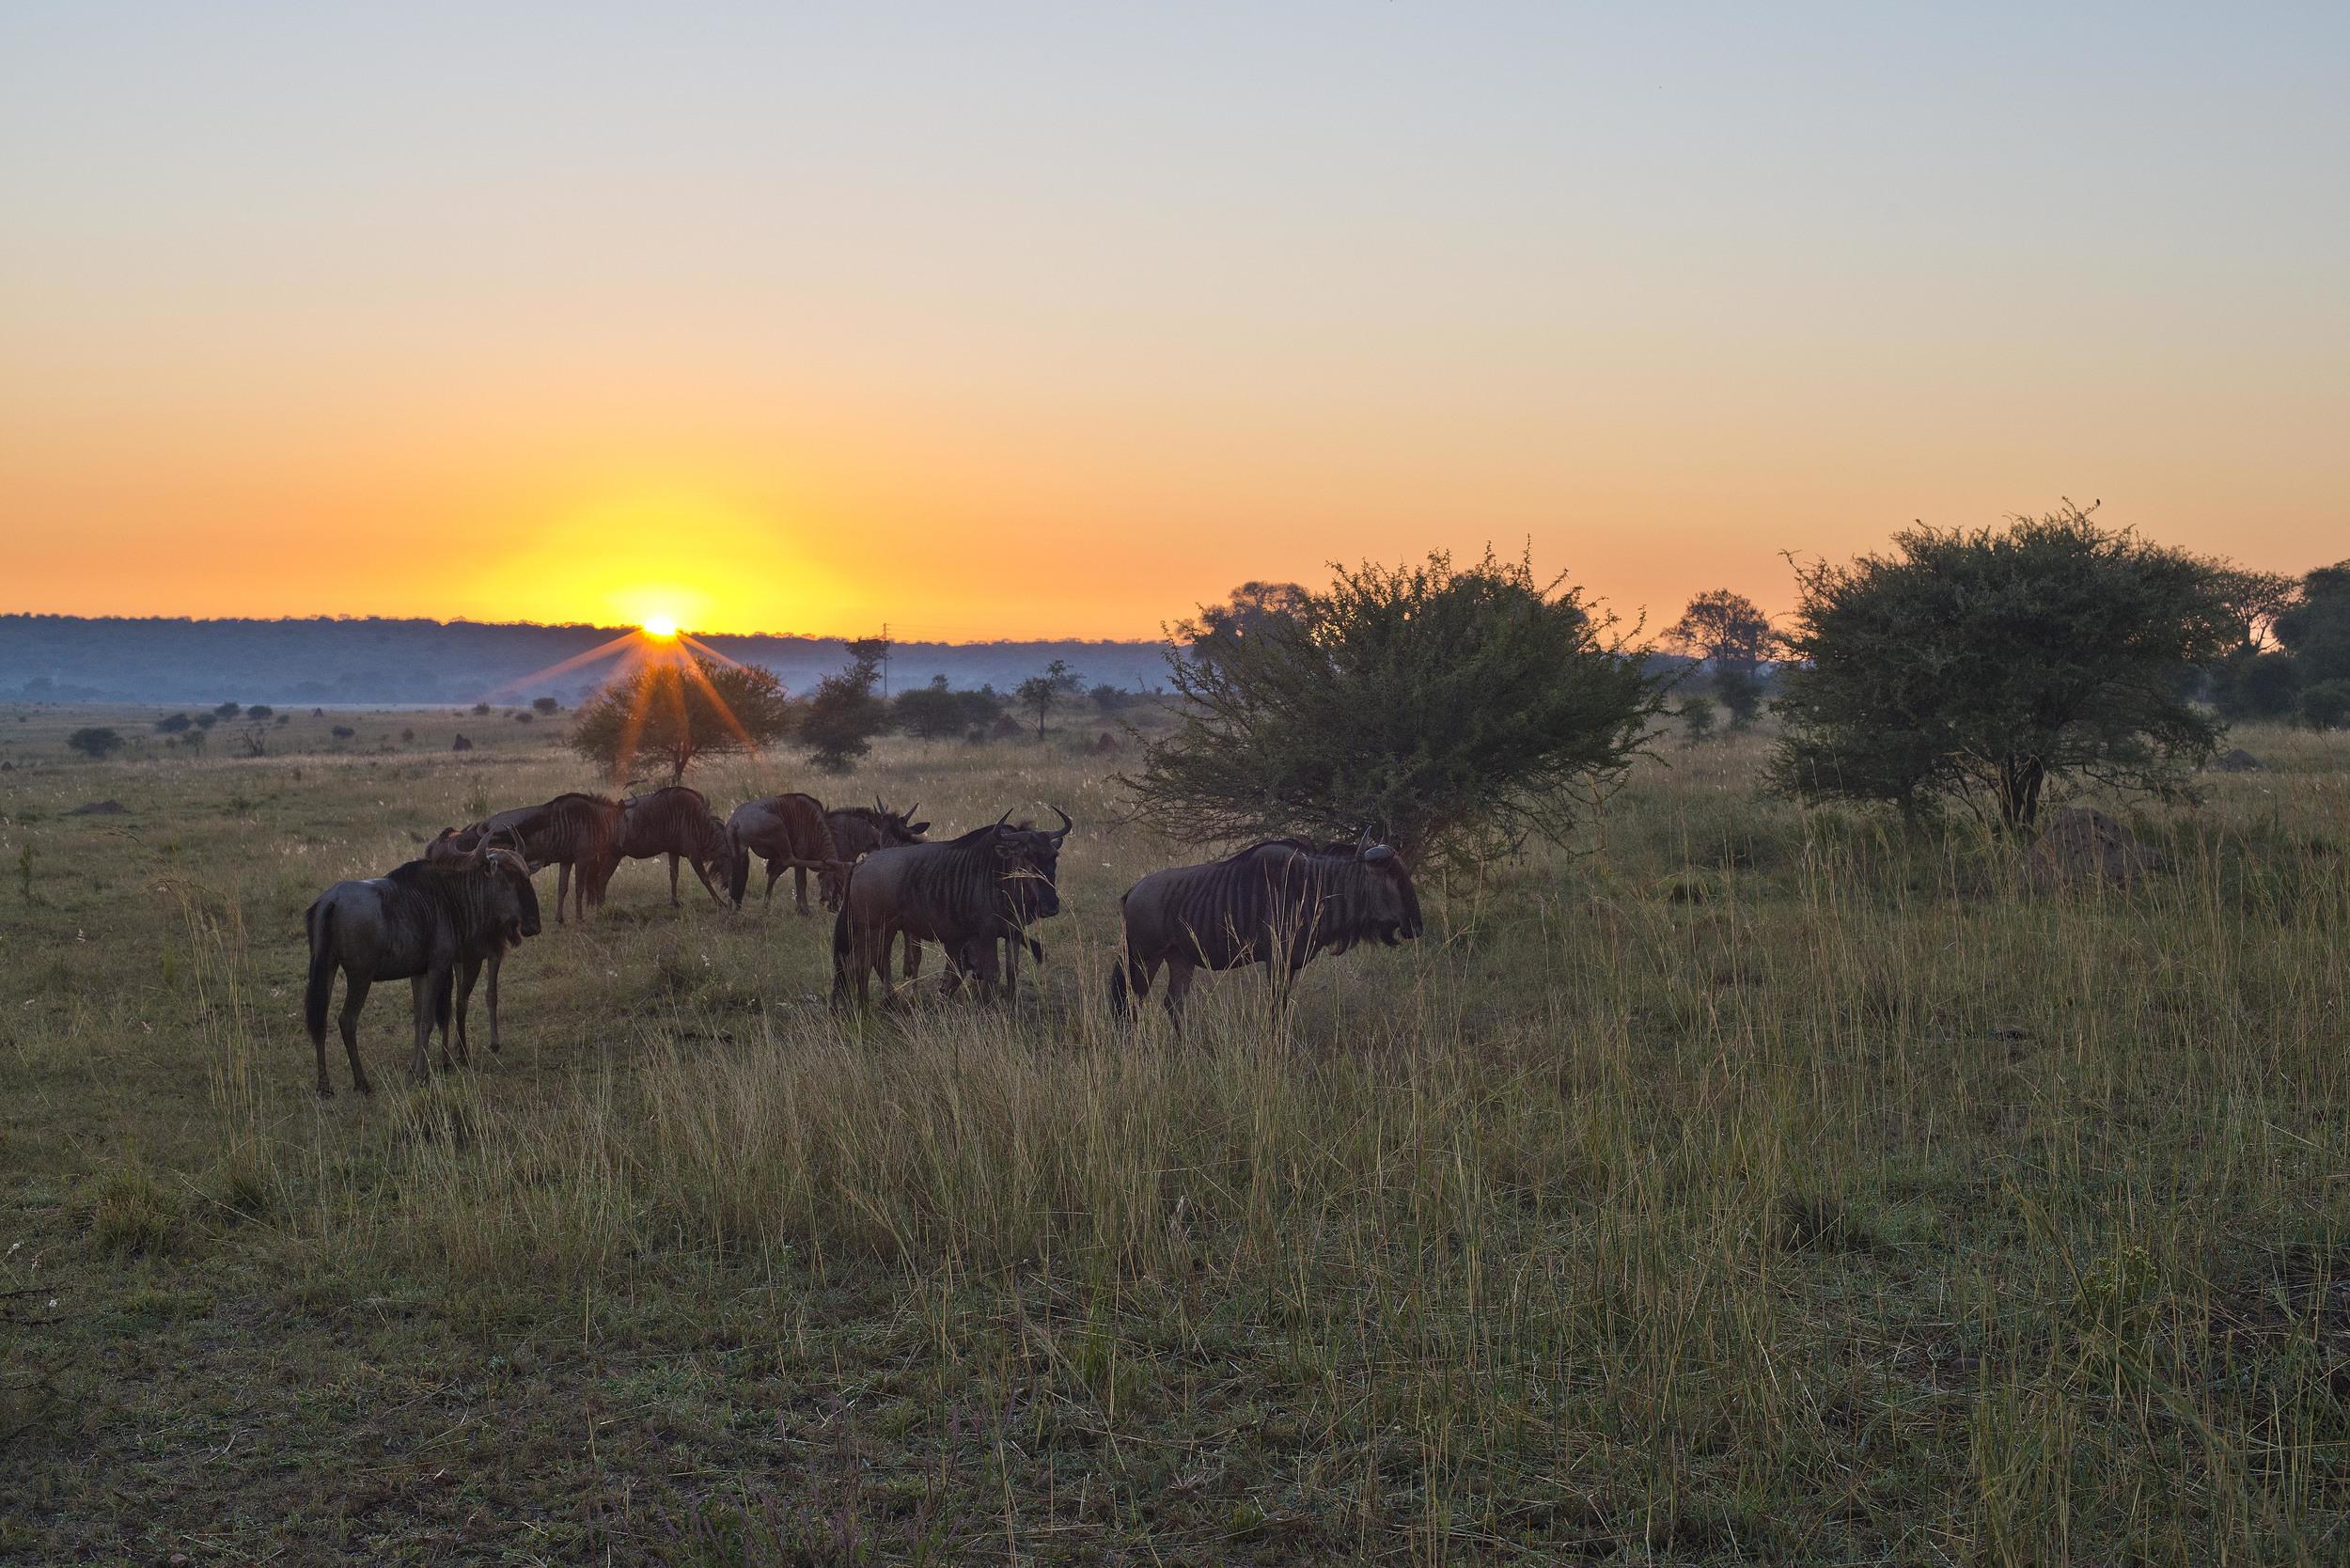 130420_DSC3514 Wildebeest on the Bushveld at Sunrise.jpg